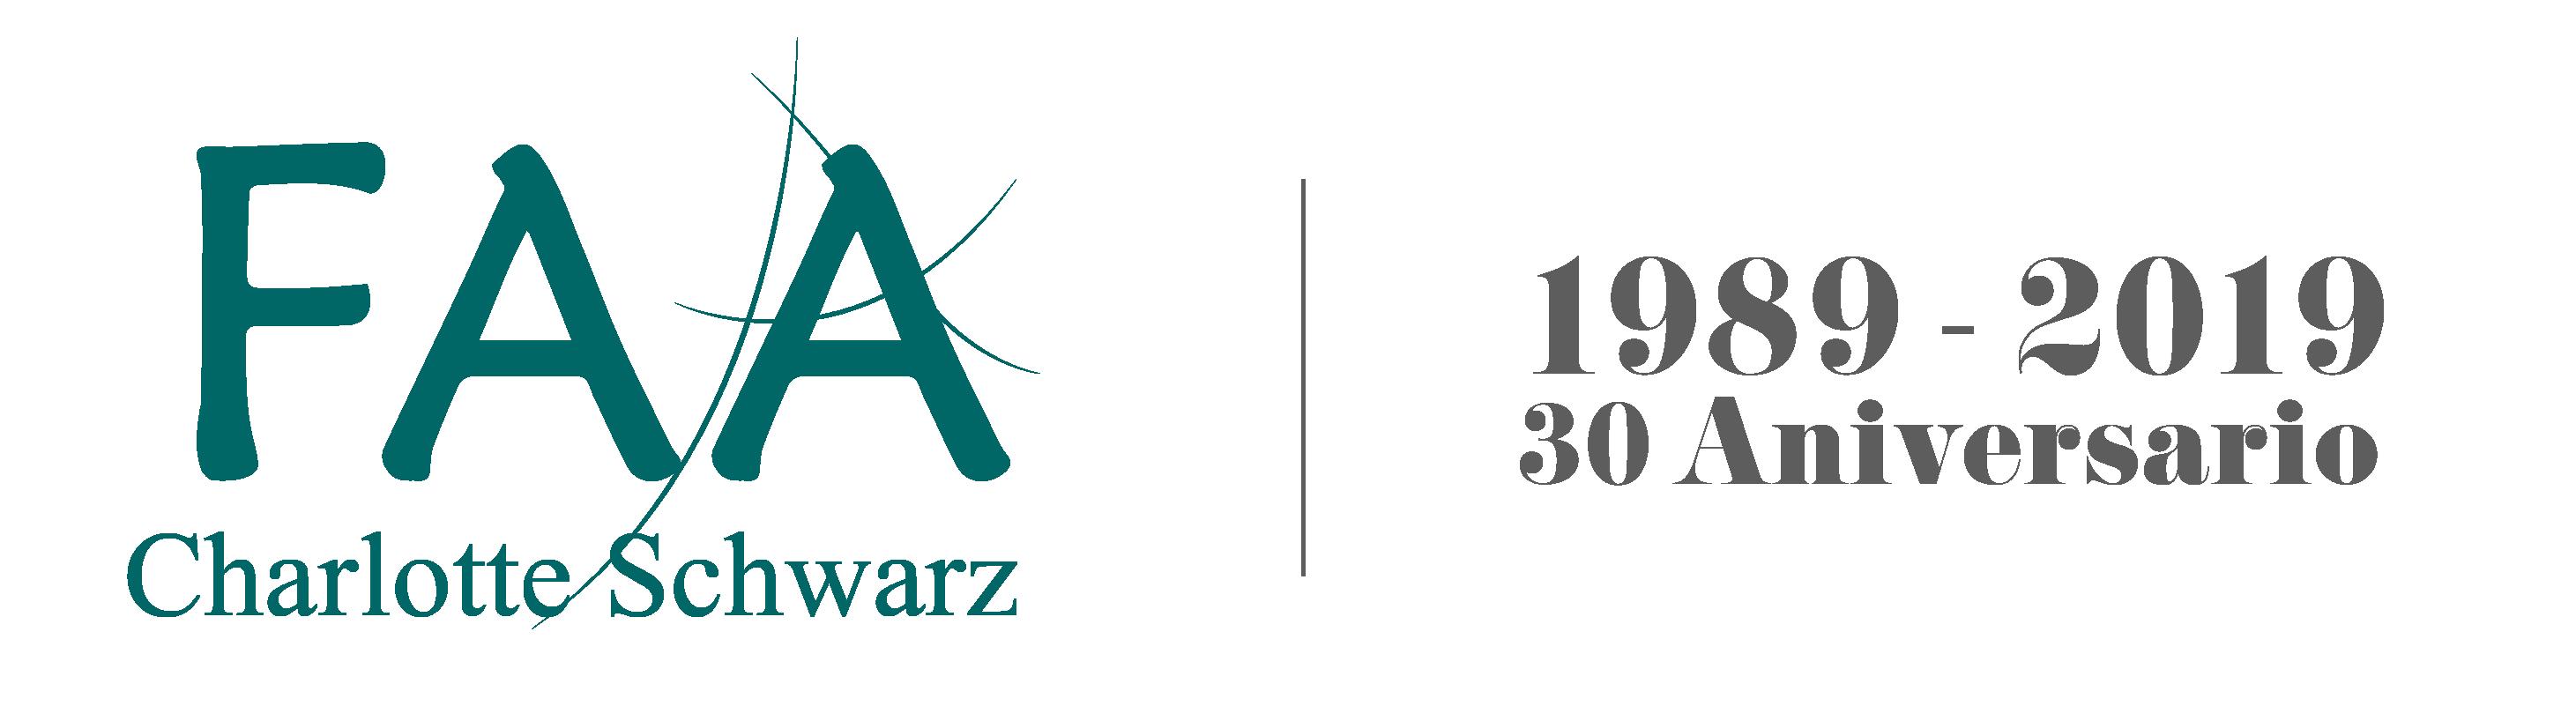 Fundación Argentina de Afasia Charlotte Schwarz